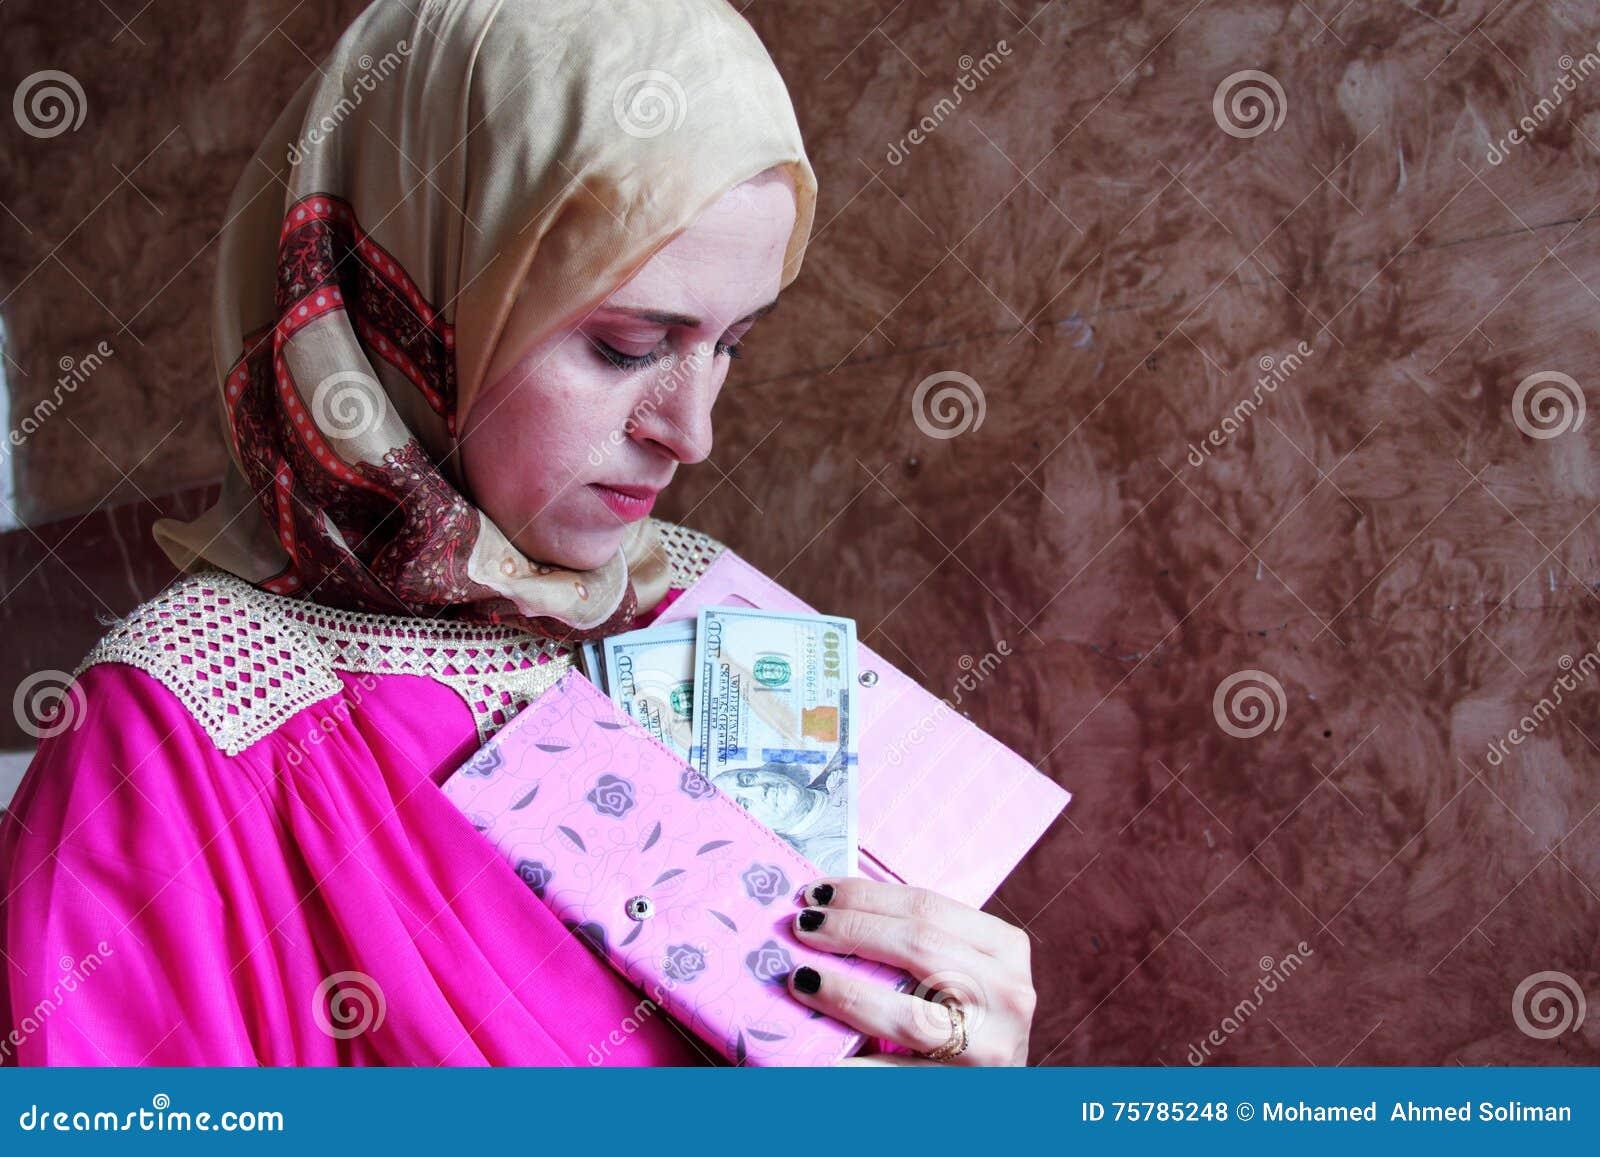 image Arab woman needs money in germany